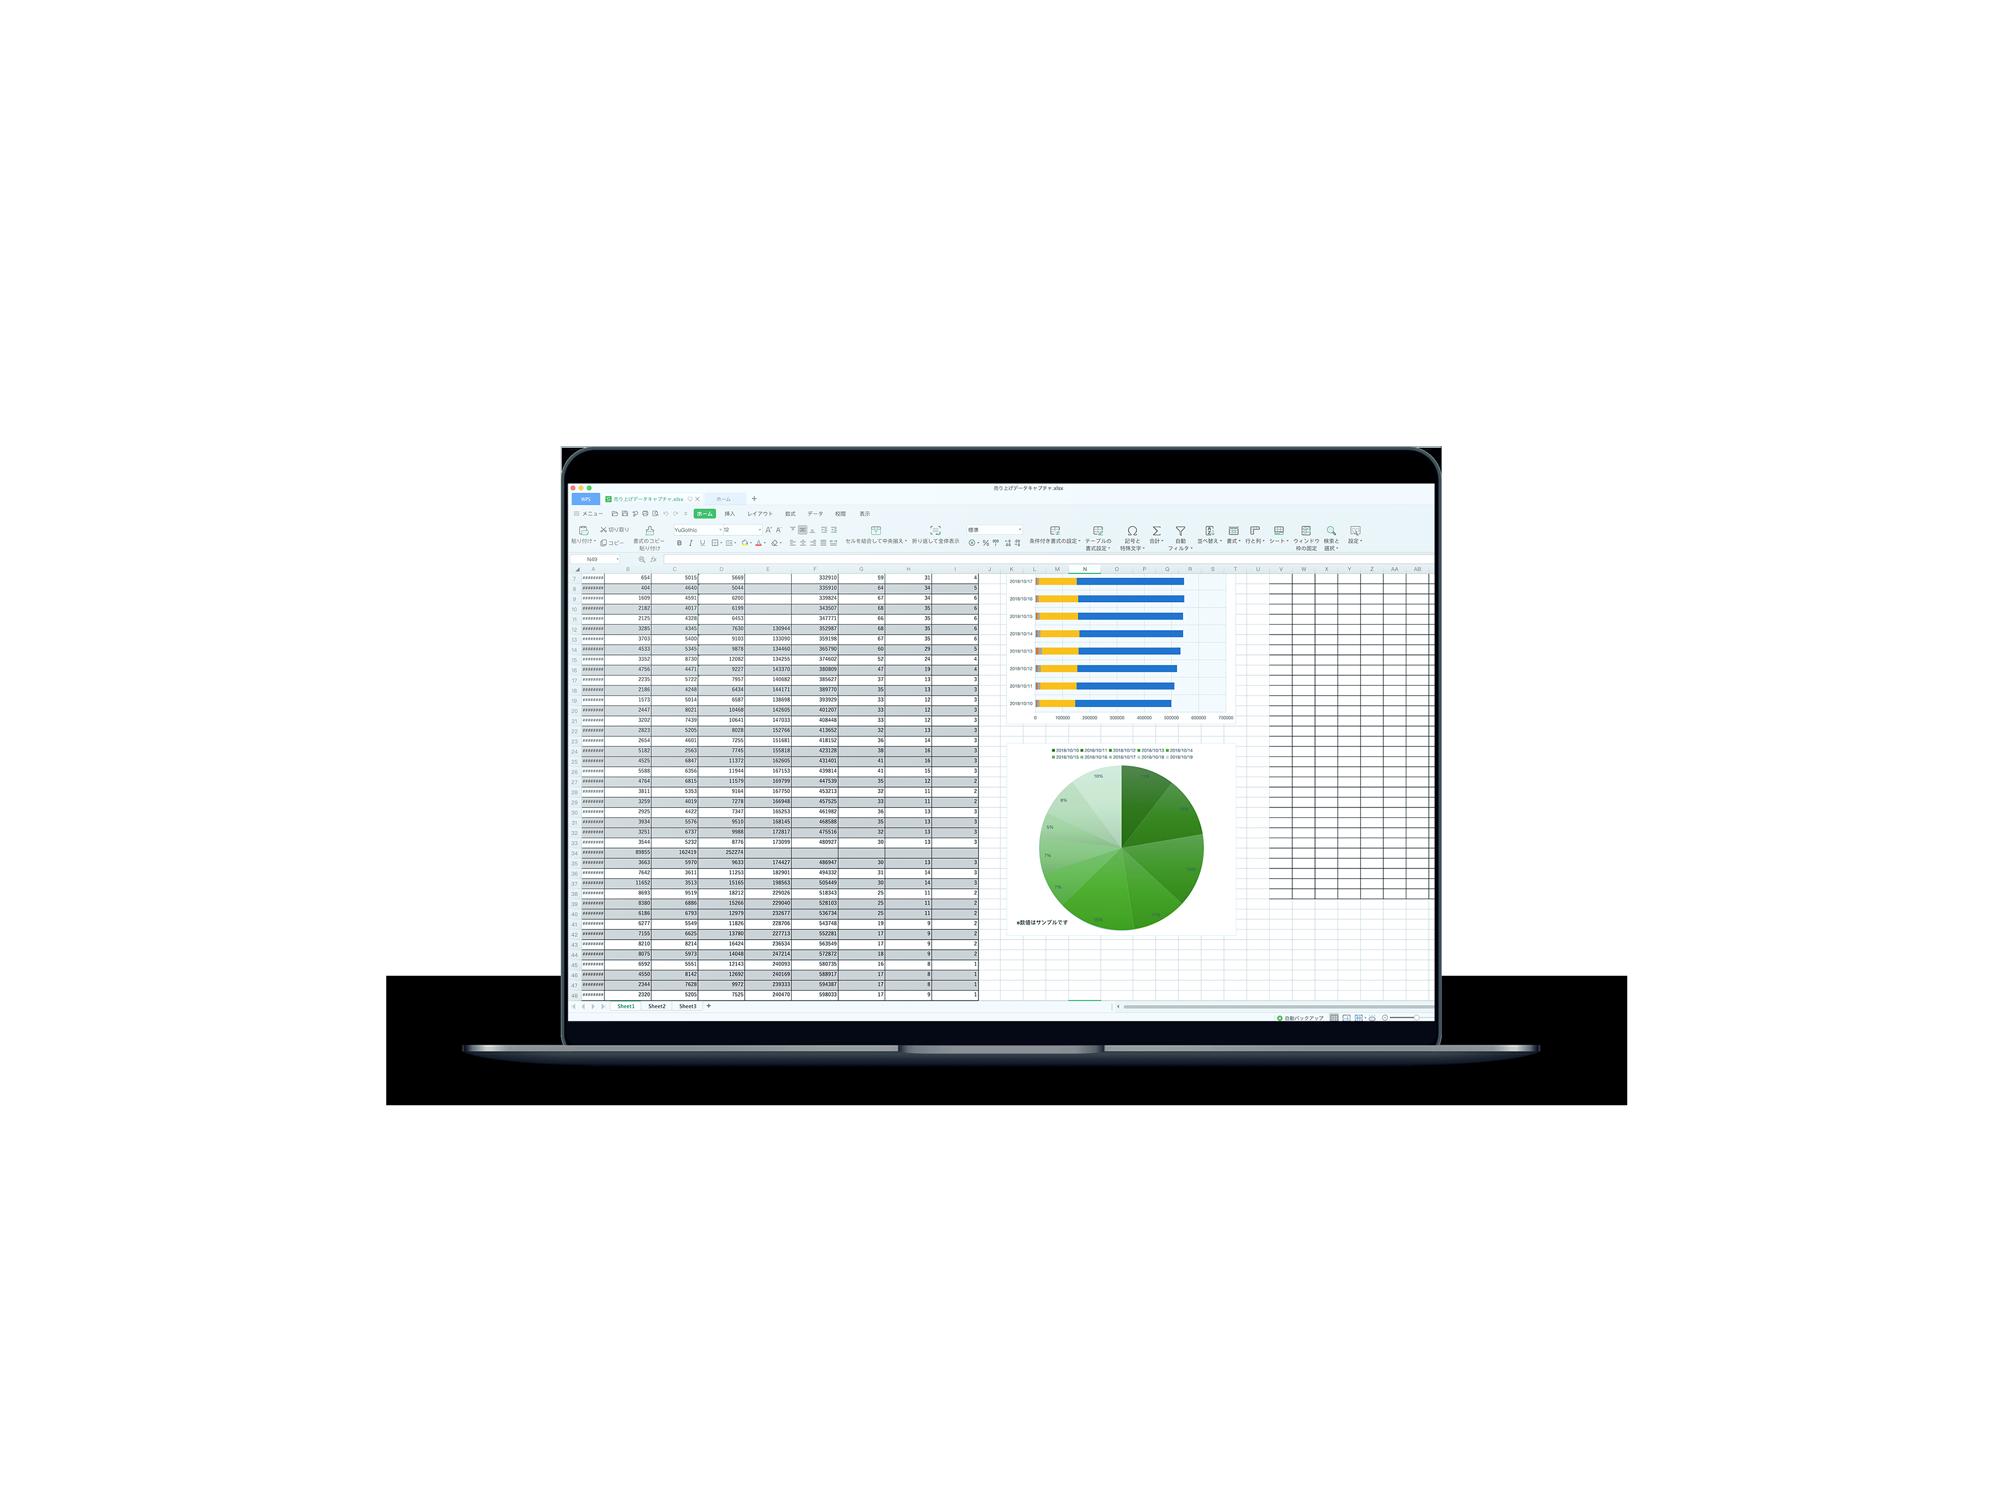 WPS Spreadsheetsイメージ